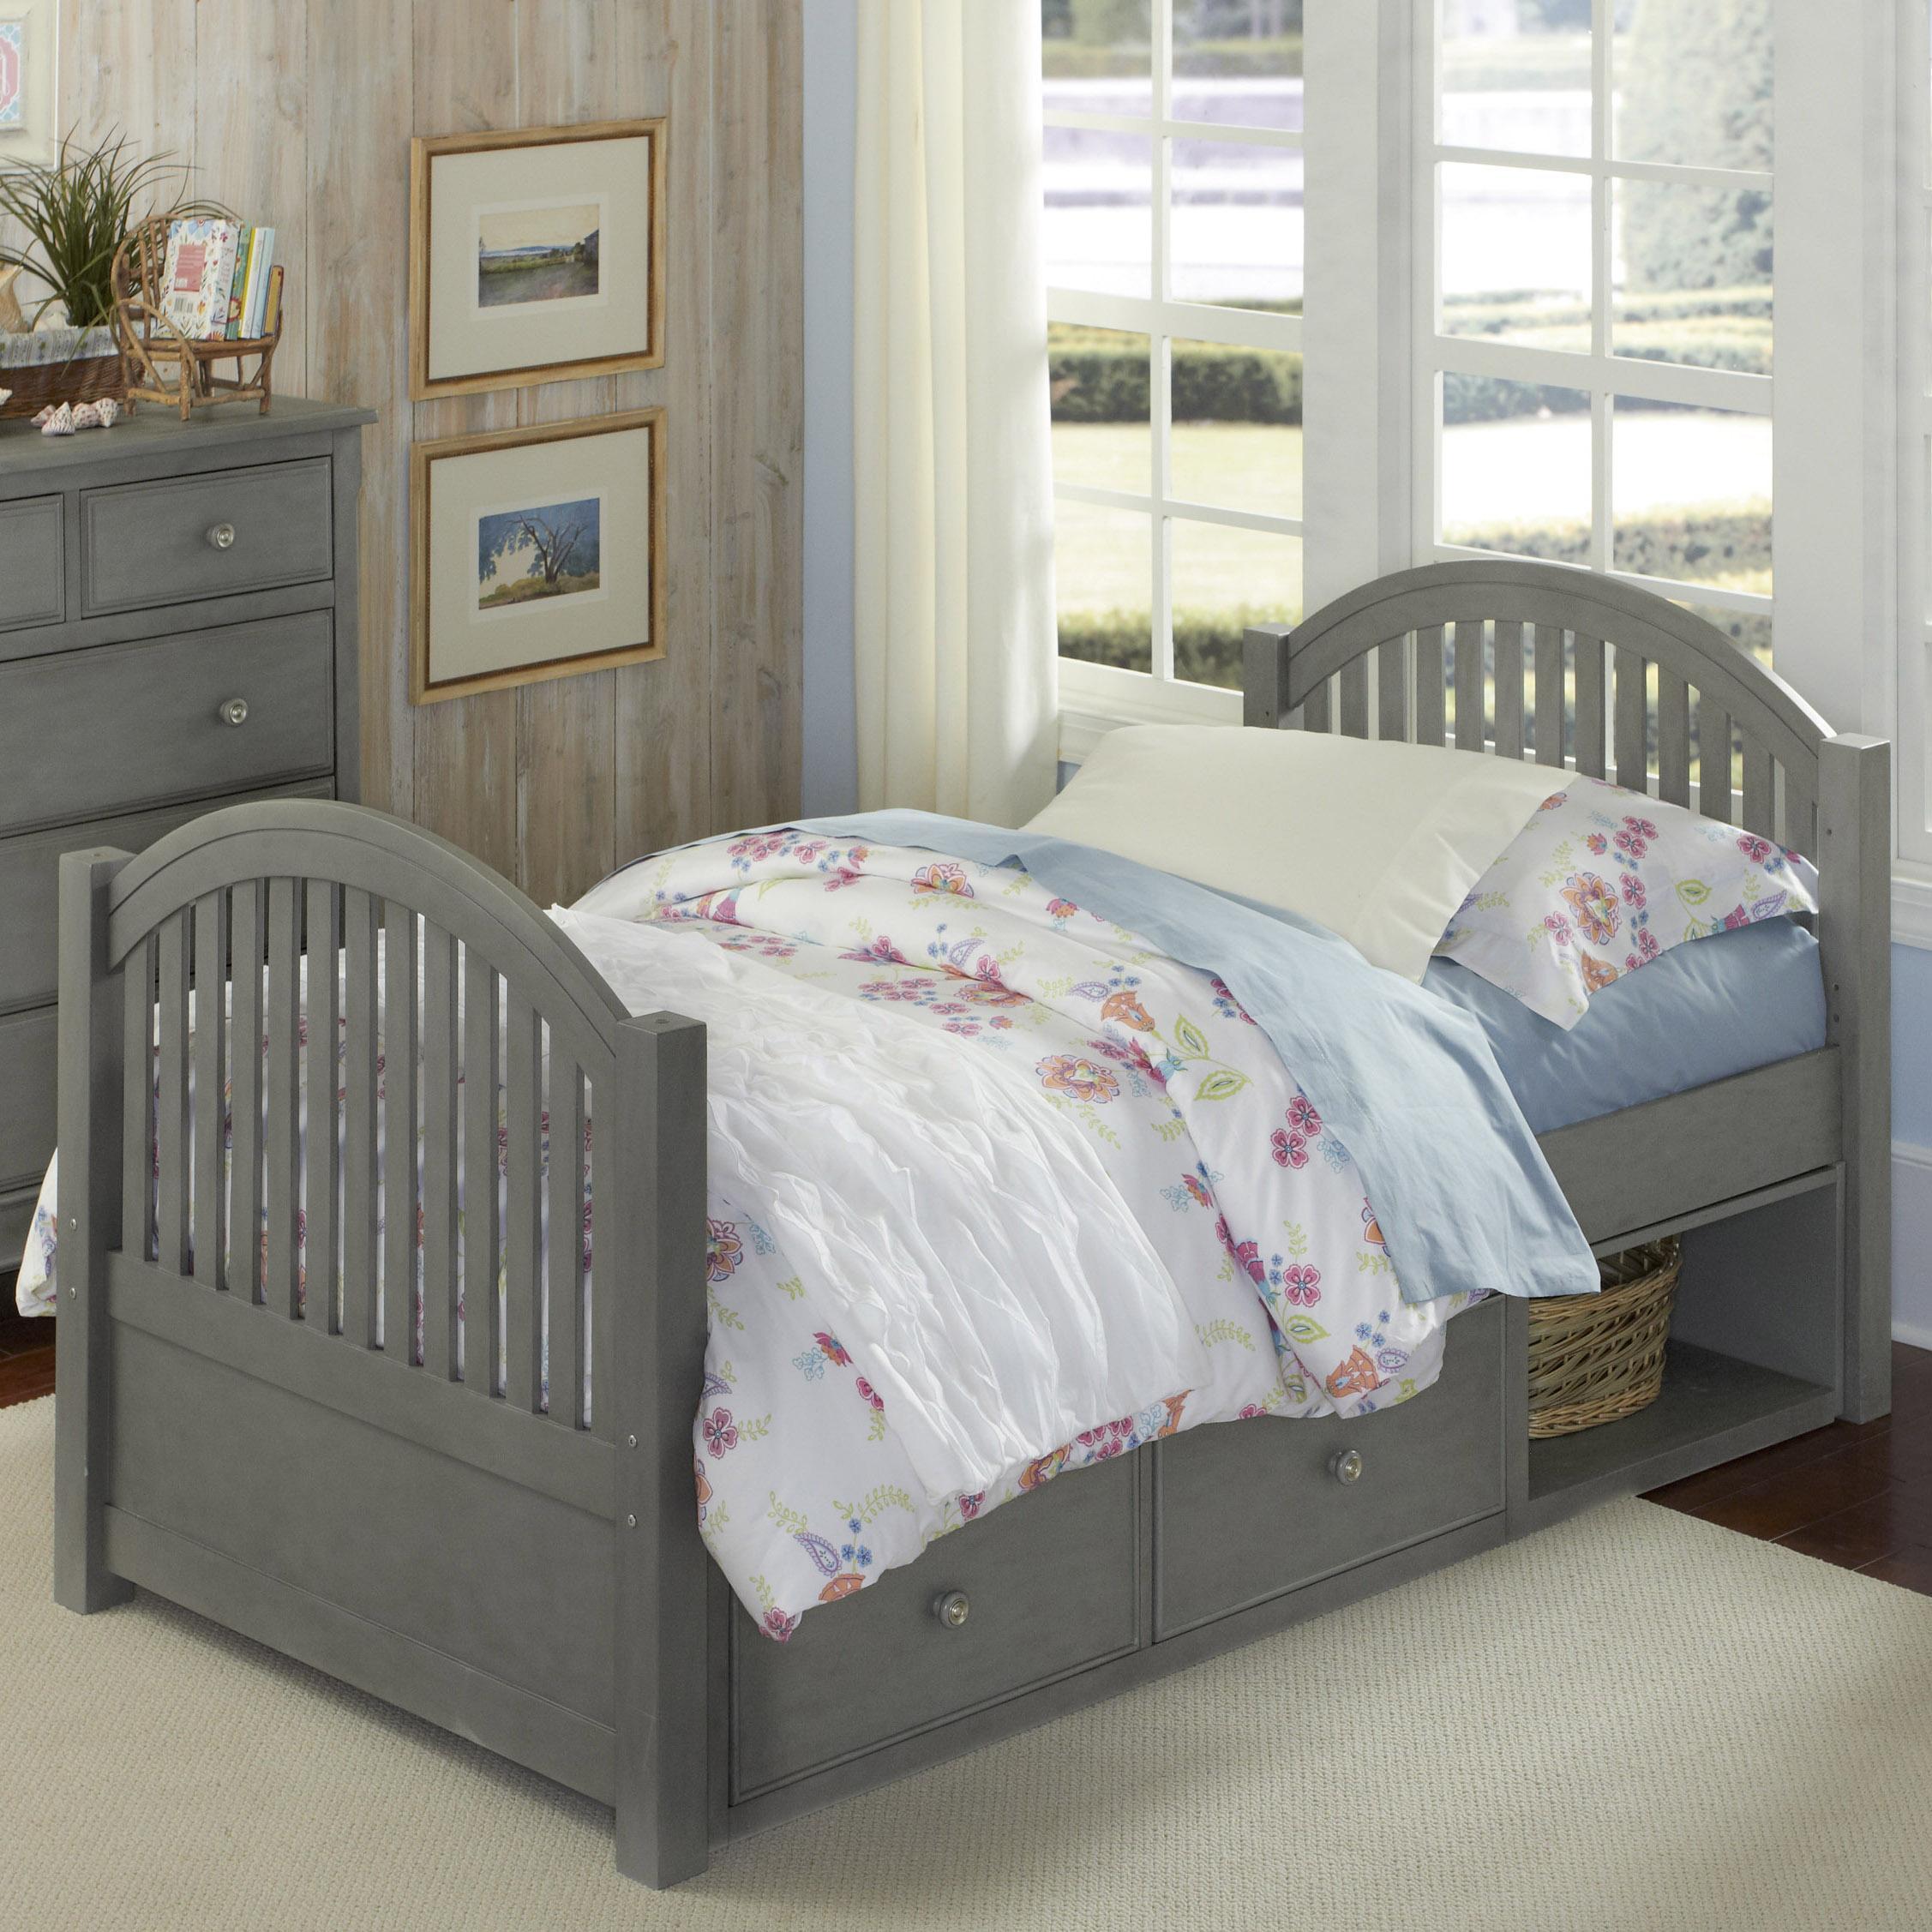 Lake House Adrian Twin Bed + Storage by NE Kids at Stoney Creek Furniture